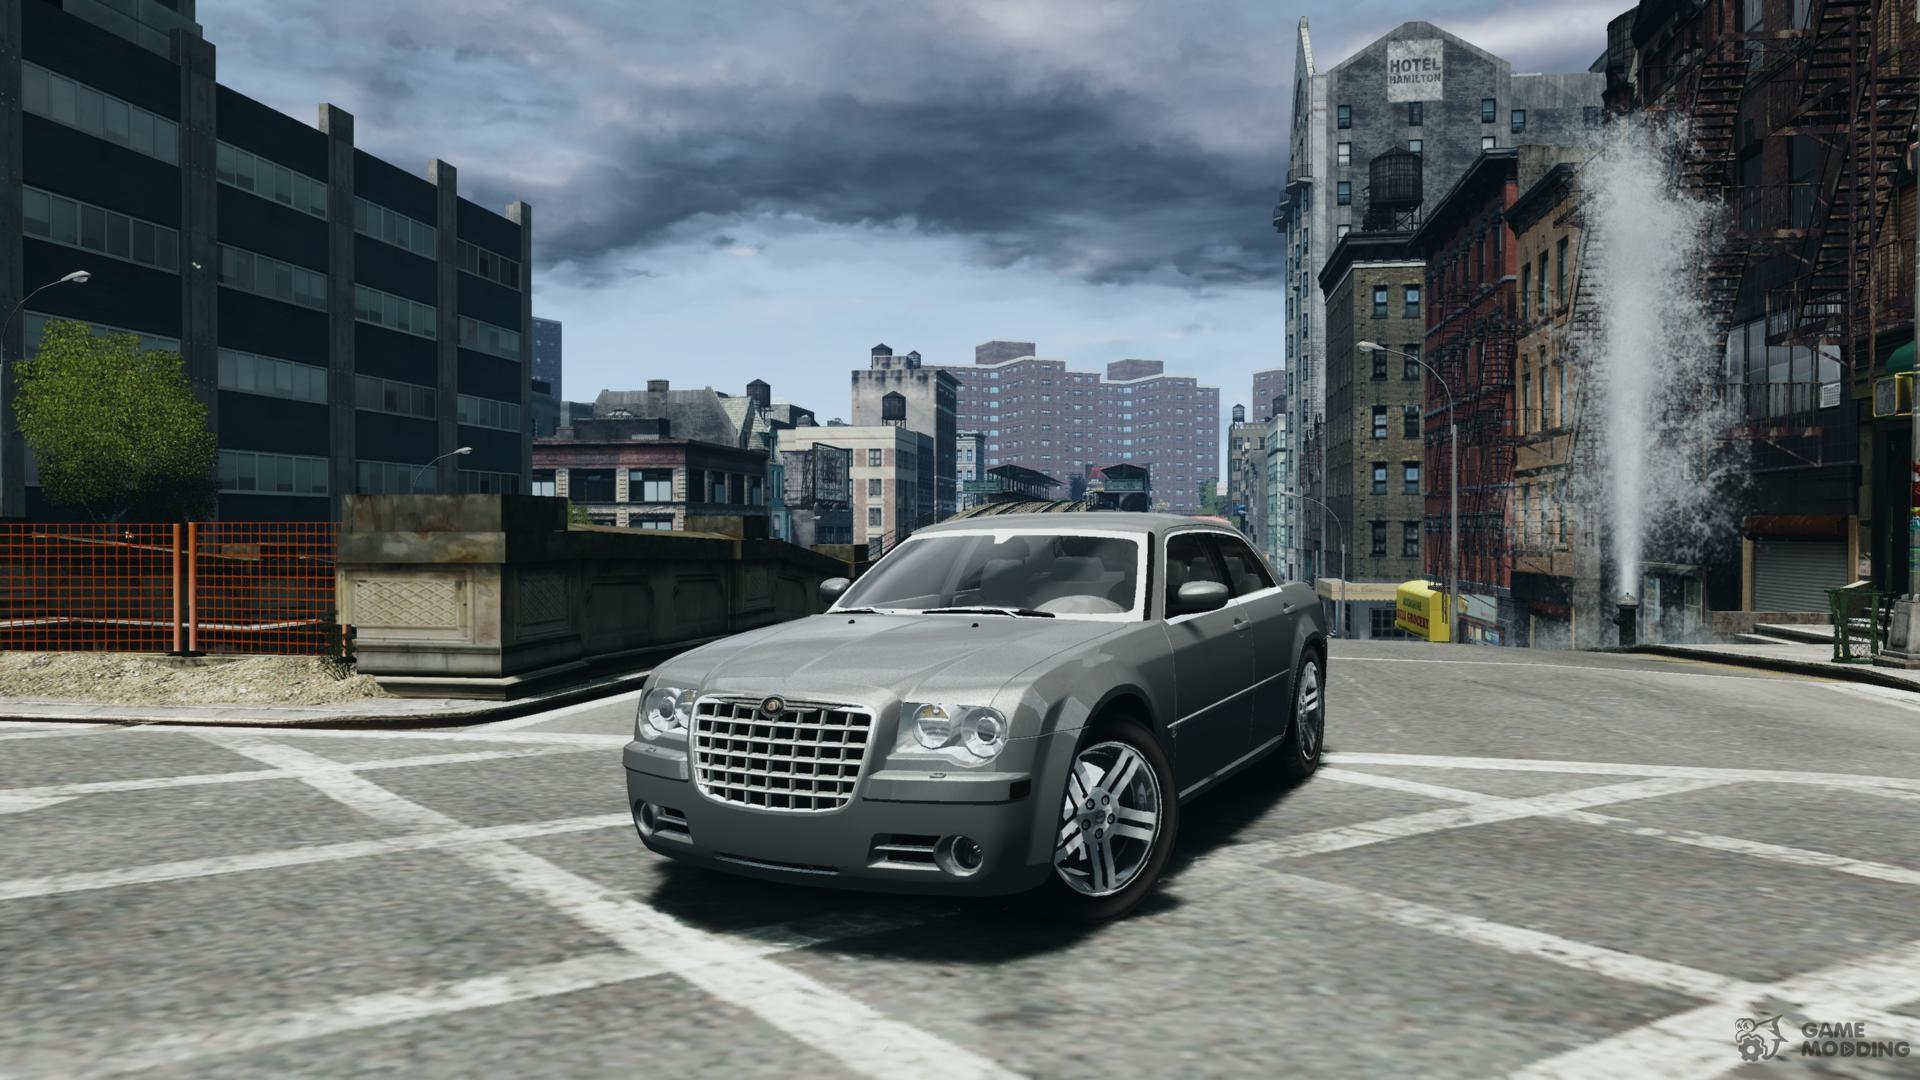 Chrysler 300 c 2005 for GTA 4 on gta 5 mitsubishi eclipse, gta 5 batmobile, gta 5 ferrari 250 gto, gta 5 mitsubishi galant, gta 5 volkswagen passat, gta 5 carbonizzare, gta 5 mitsubishi lancer, gta 5 eagle, gta 5 acura tl, gta 5 shelby mustang, gta 5 nissan 370z, gta 5 nissan gt-r, gta 5 holden commodore, gta 5 porsche 918, gta 5 jaguar x-type, gta 5 chevy malibu, gta 5 nissan 240sx, gta 5 ford bronco, gta 5 hennessey venom gt, gta 5 acura nsx,